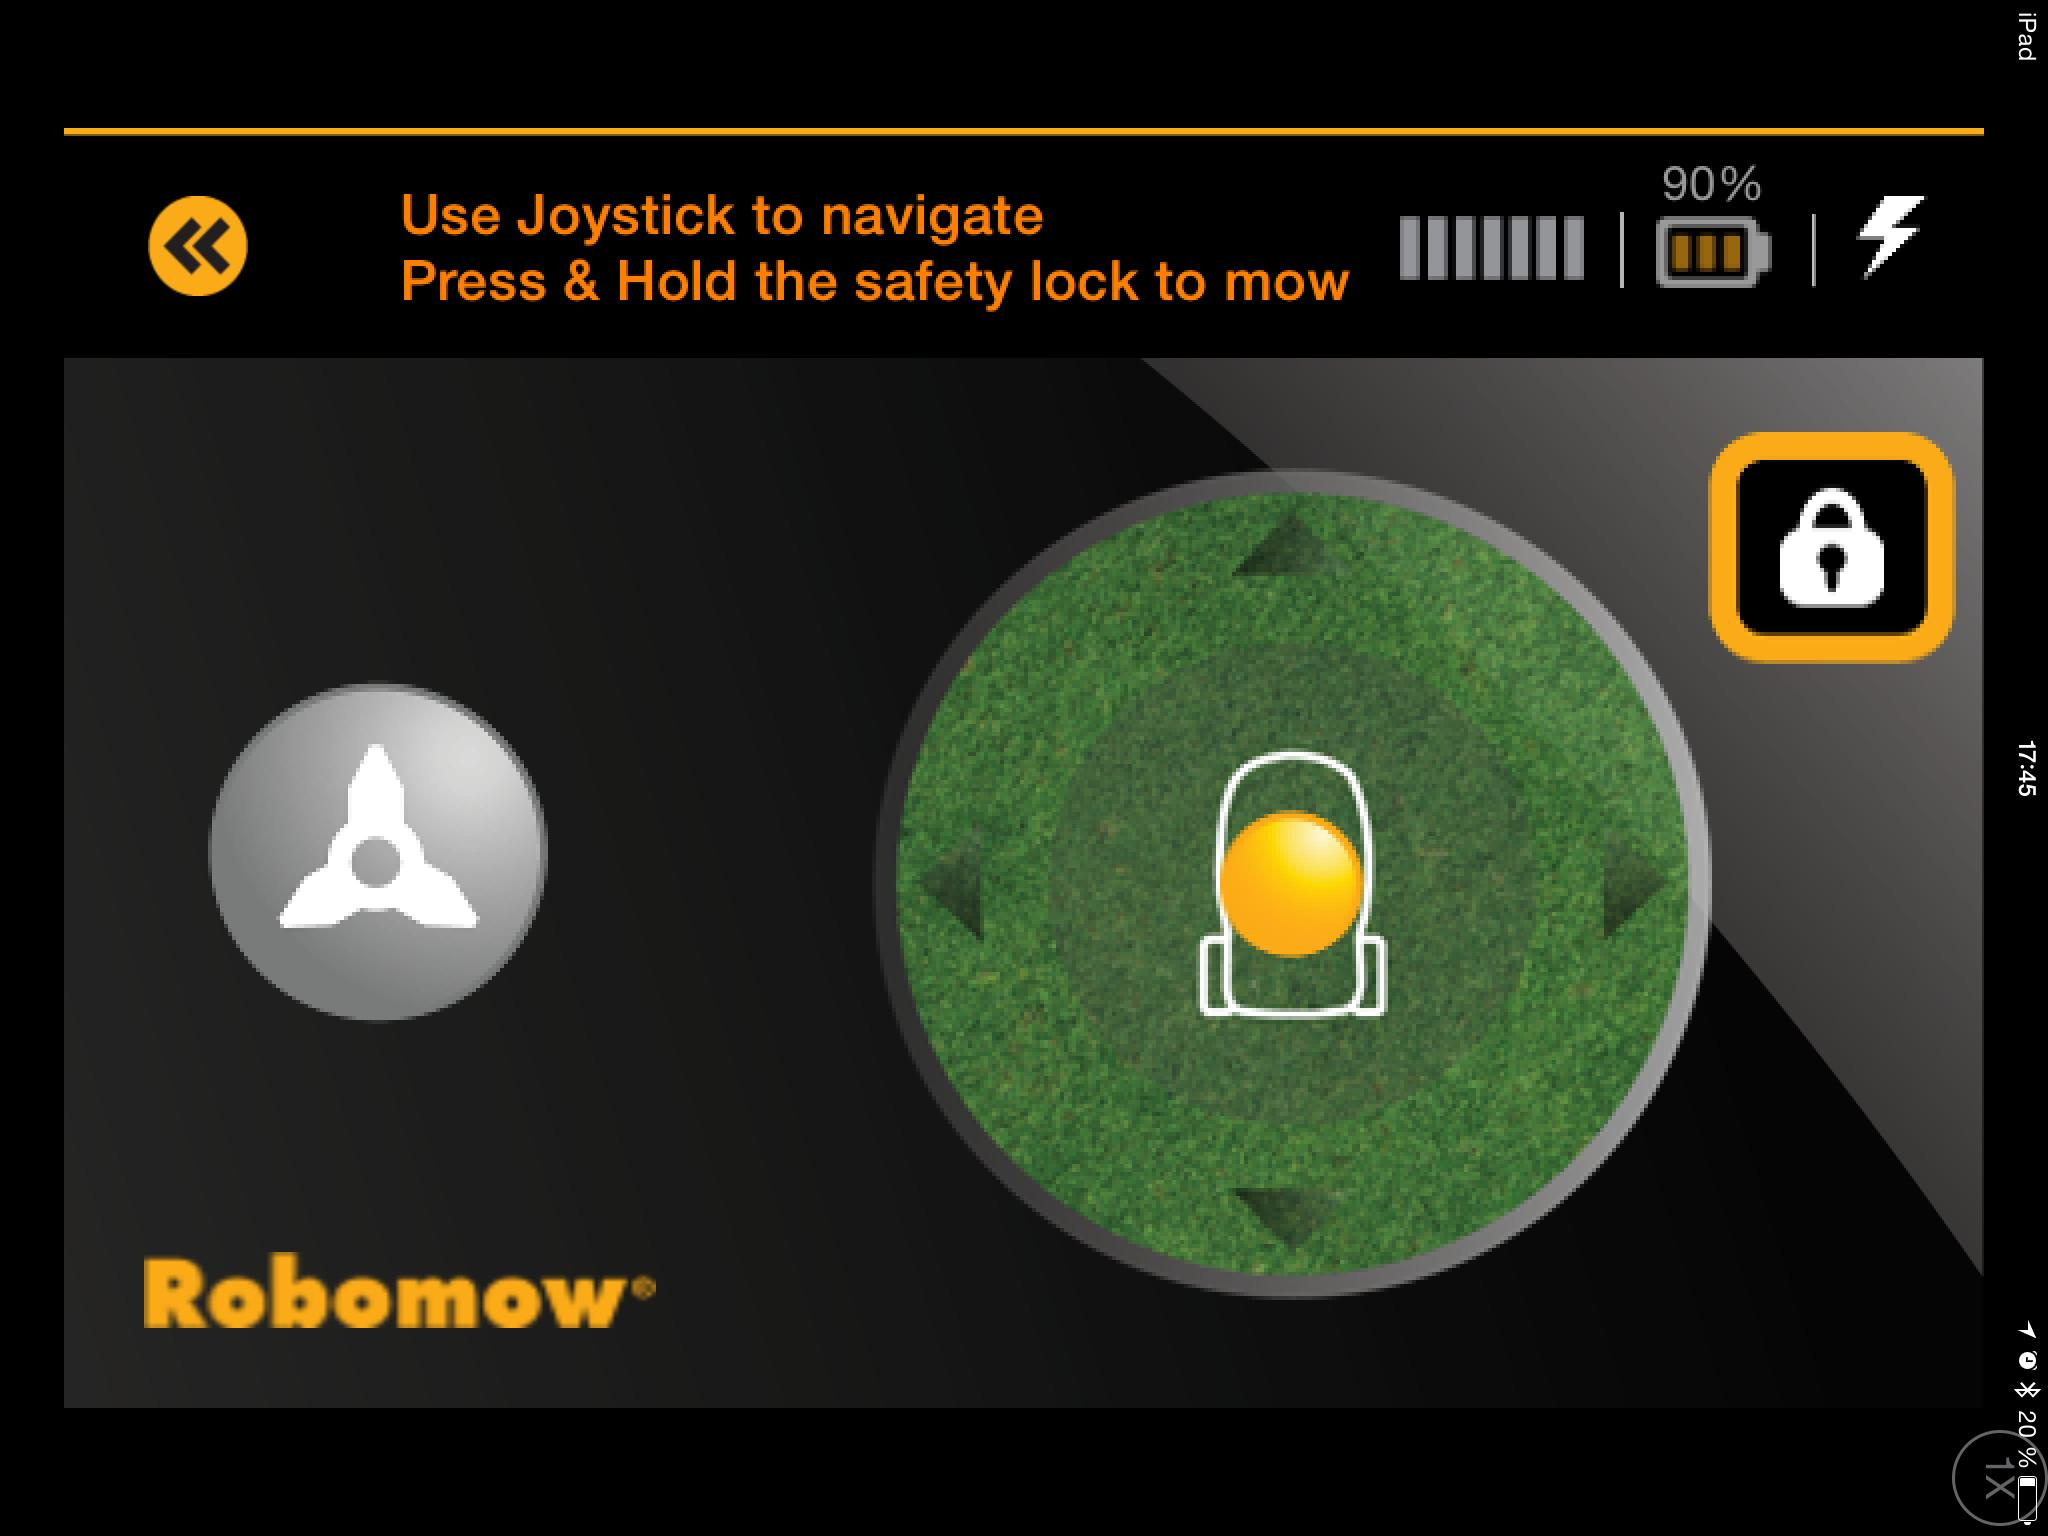 Ørn, ørn! Slik styrer vi Robomow fra en iPad. Appen er ikke perfekt, men den får jobben gjort.Foto: Finn Jarle Kvalheim, Amobil.no